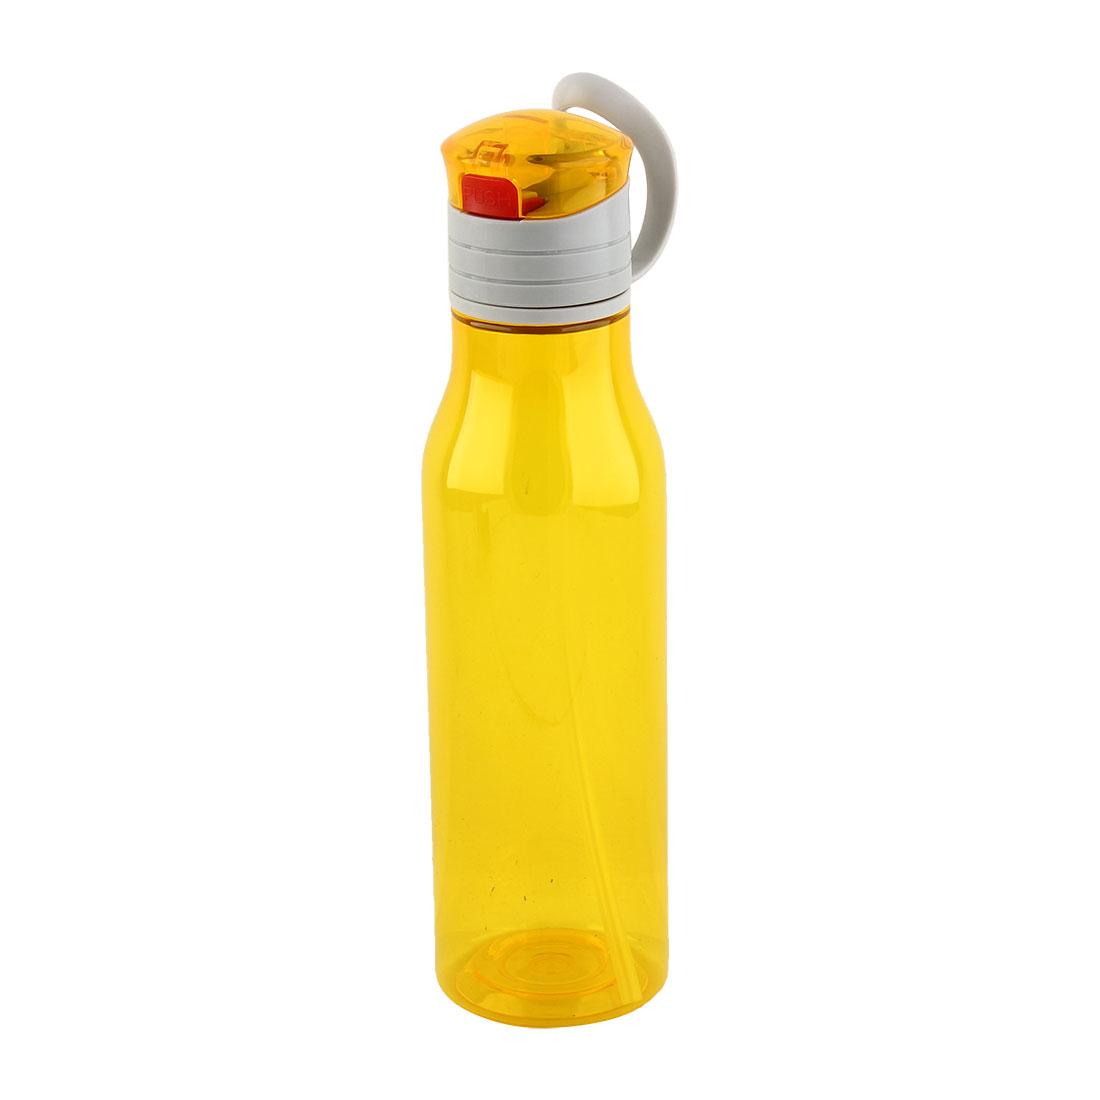 Outdoor Sports Plastic Straw Water Bottle Portable Fruit Juice Mug Biking Canteen Hiking Kettle Yellow 570ml